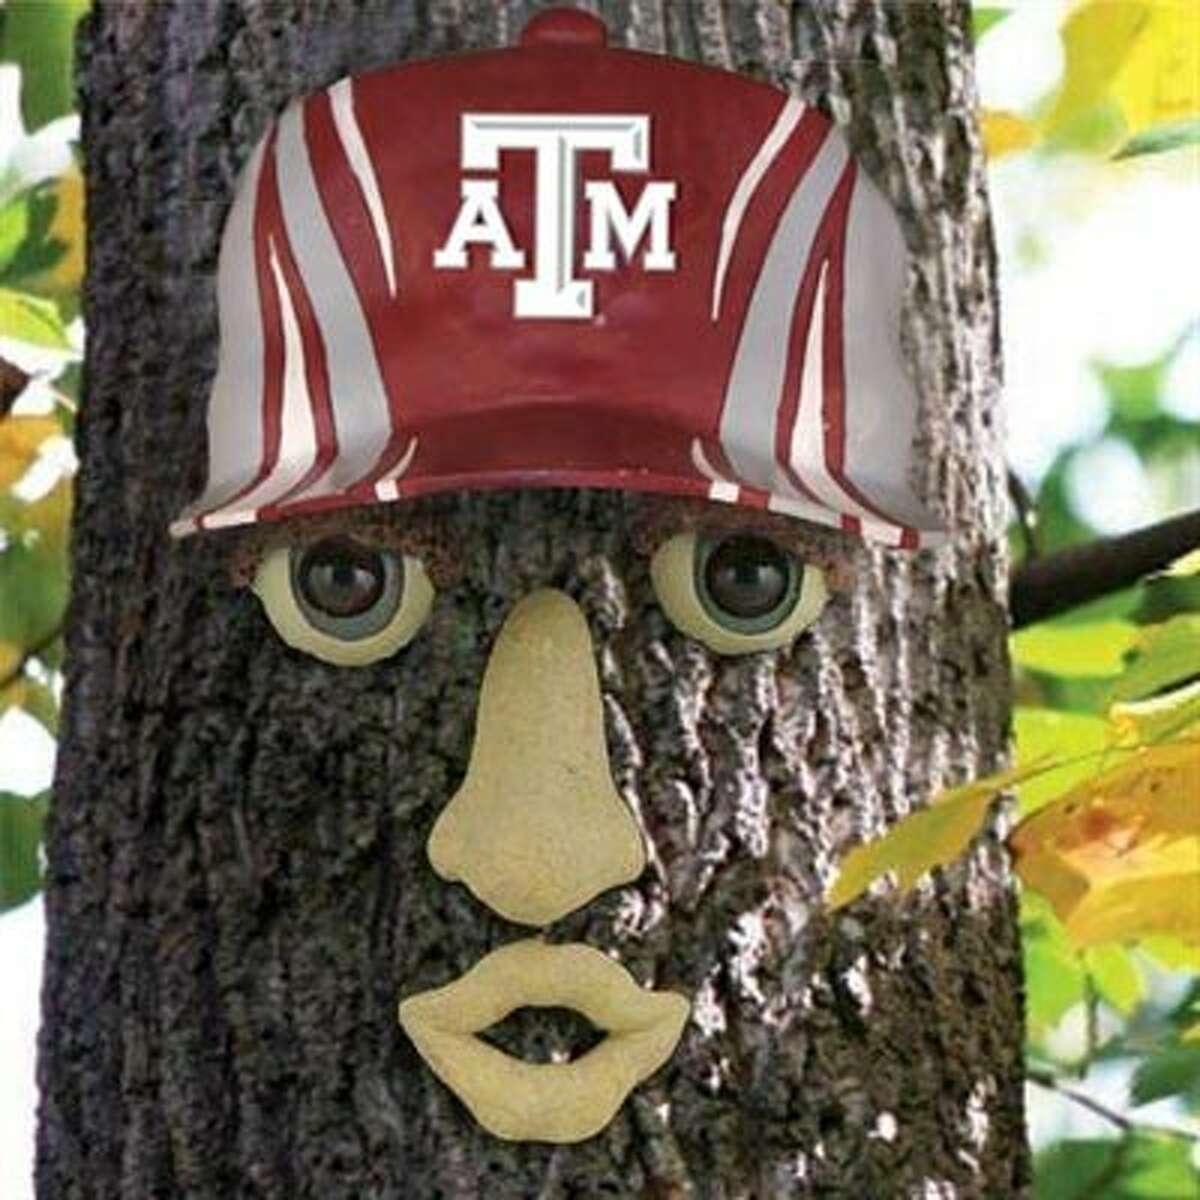 A Texas A&M Aggies resin tree face ornament.